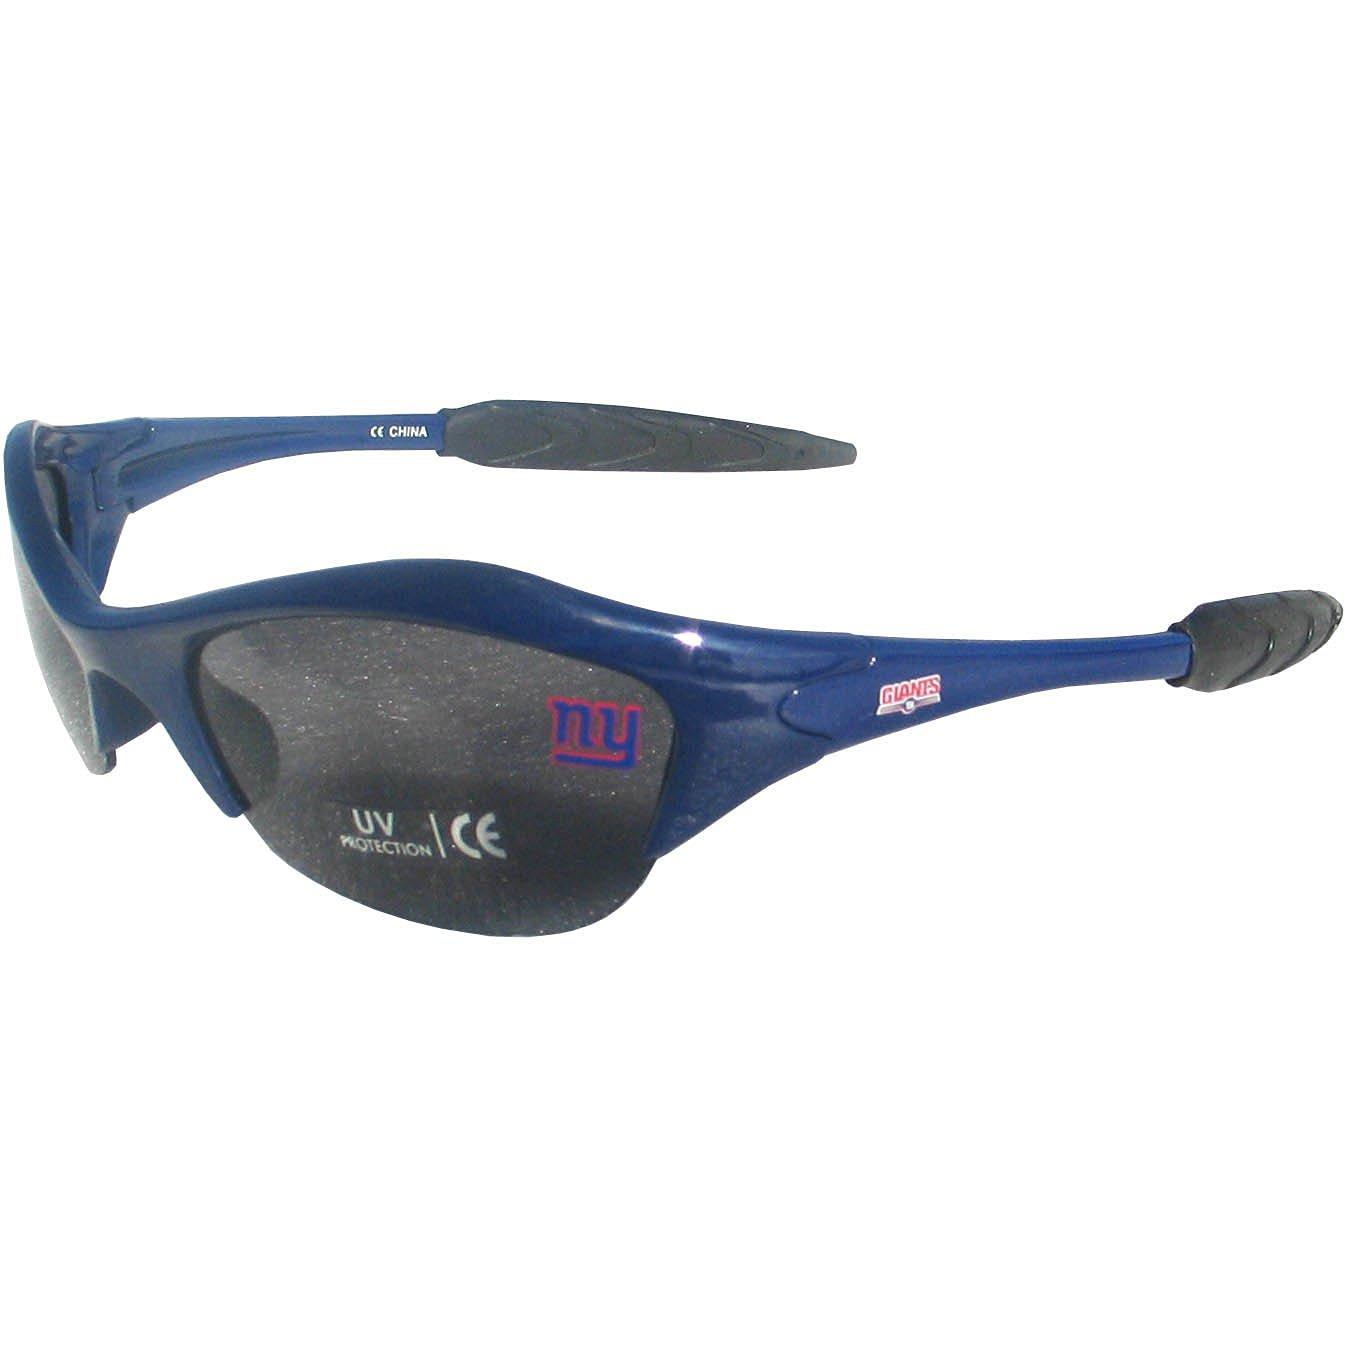 4290fb35375 Get Quotations · NFL New York Giants Half Frame Sunglasses